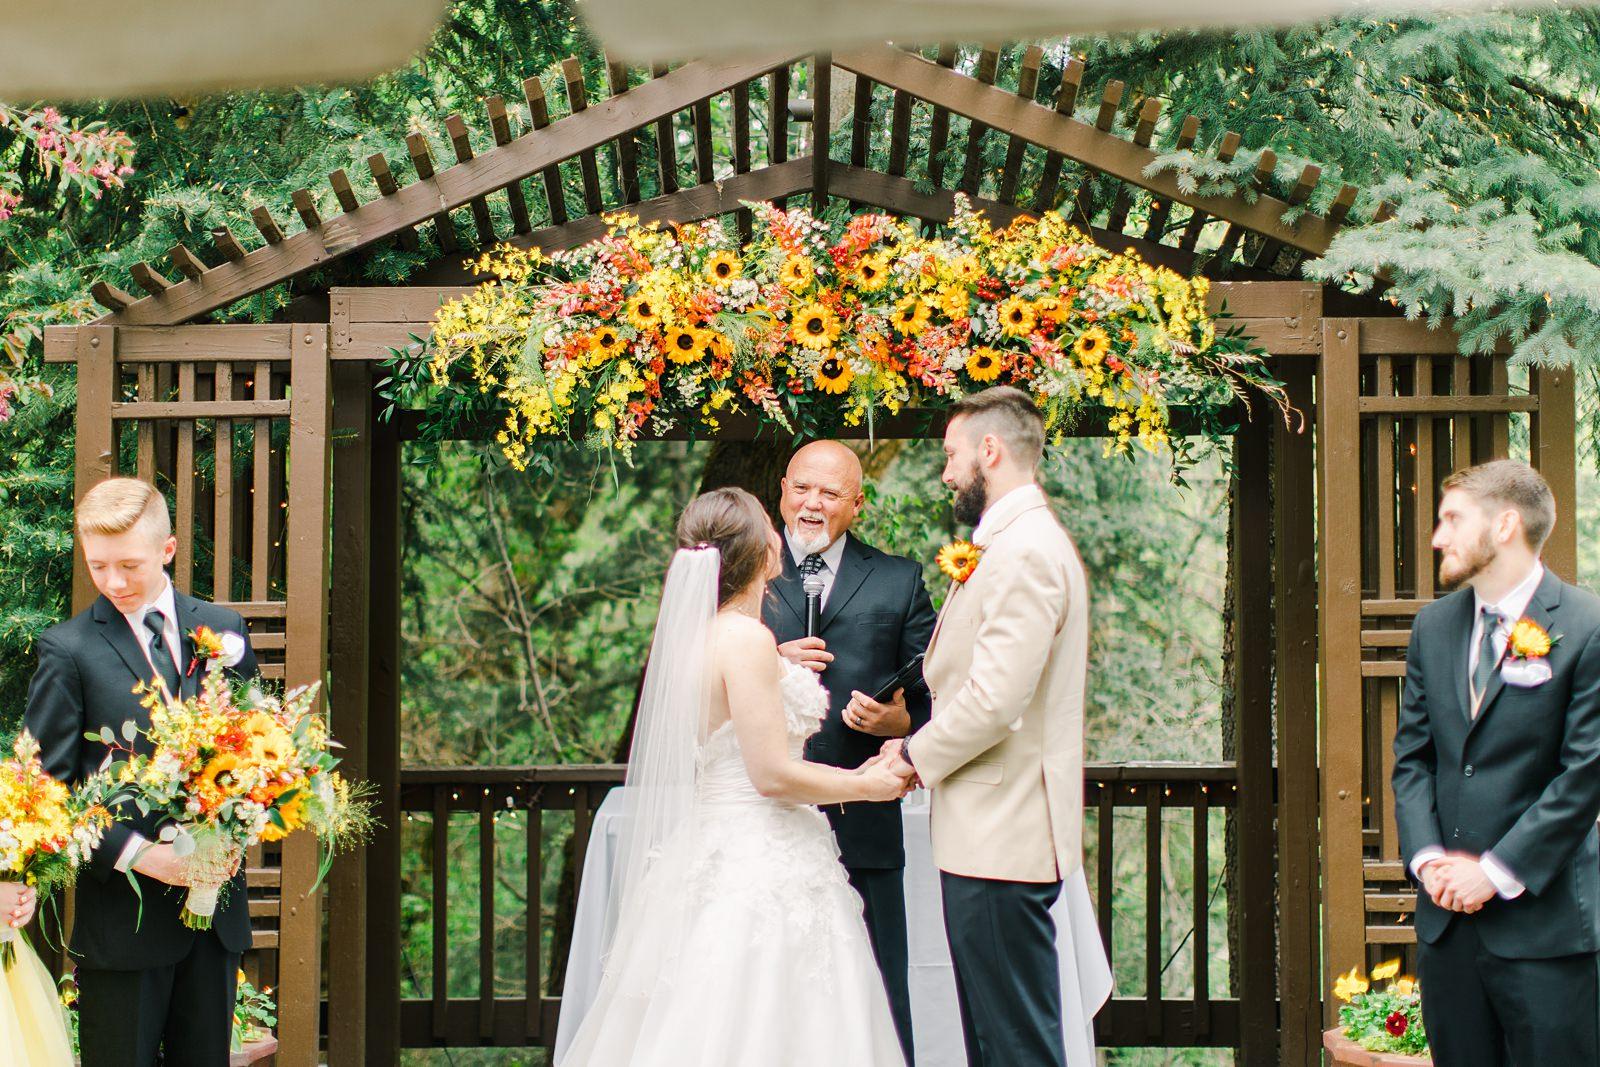 Millcreek Inn Summer Wedding, Utah wedding photography Millcreek Canyon, Salt Lake City, mountain ceremony, bride and groom under sunflower wildflower arch